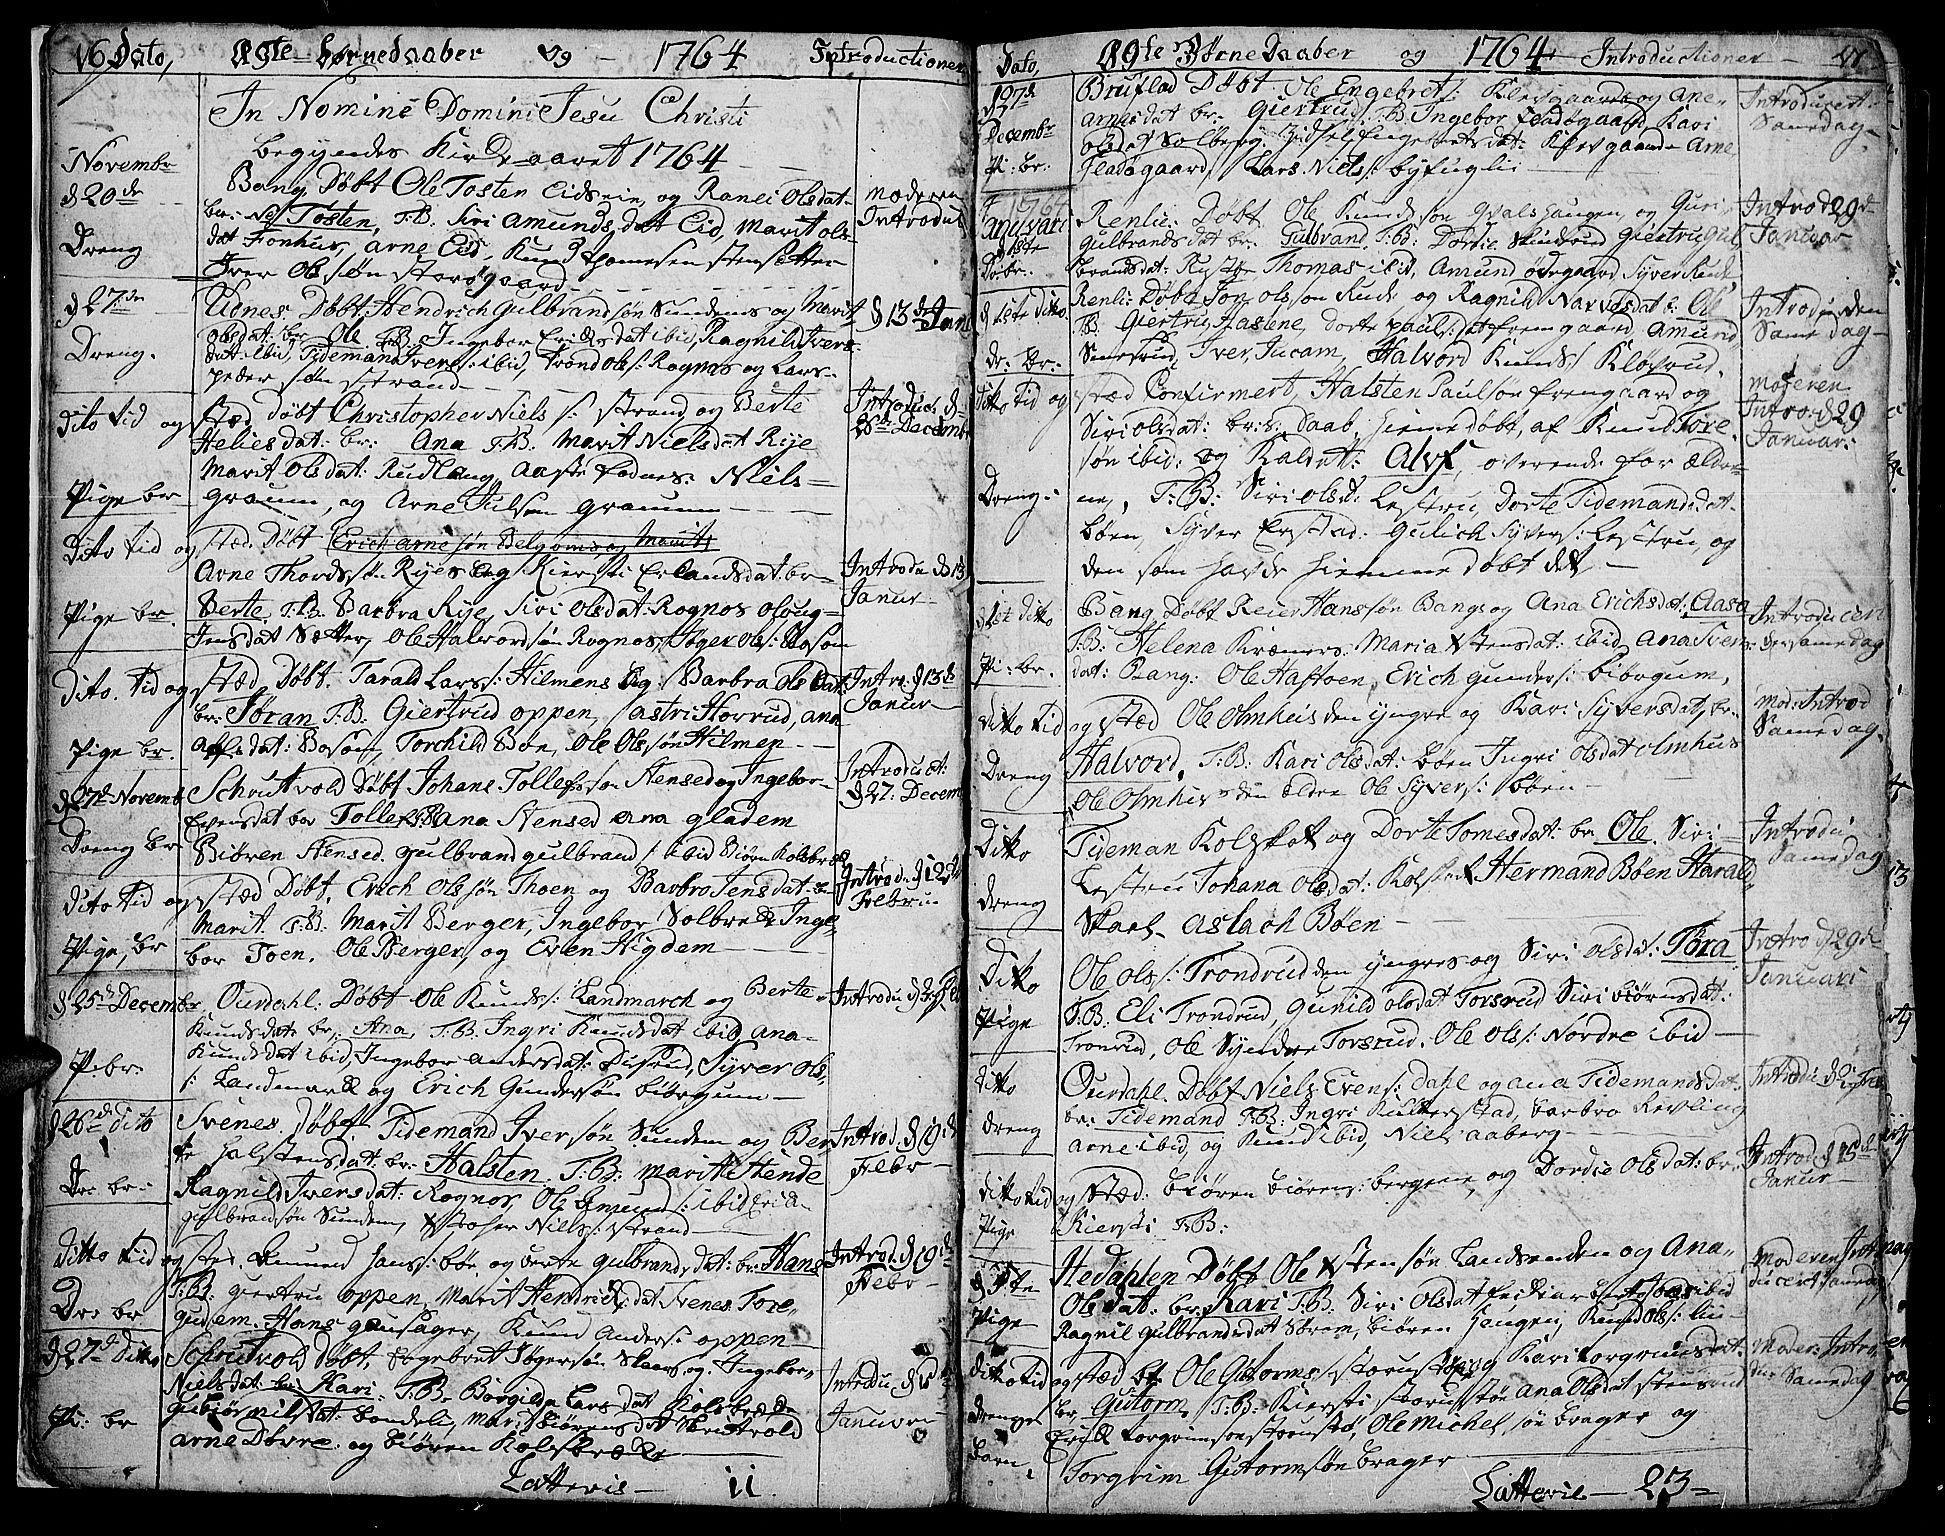 SAH, Aurdal prestekontor, Ministerialbok nr. 5, 1763-1781, s. 16-17